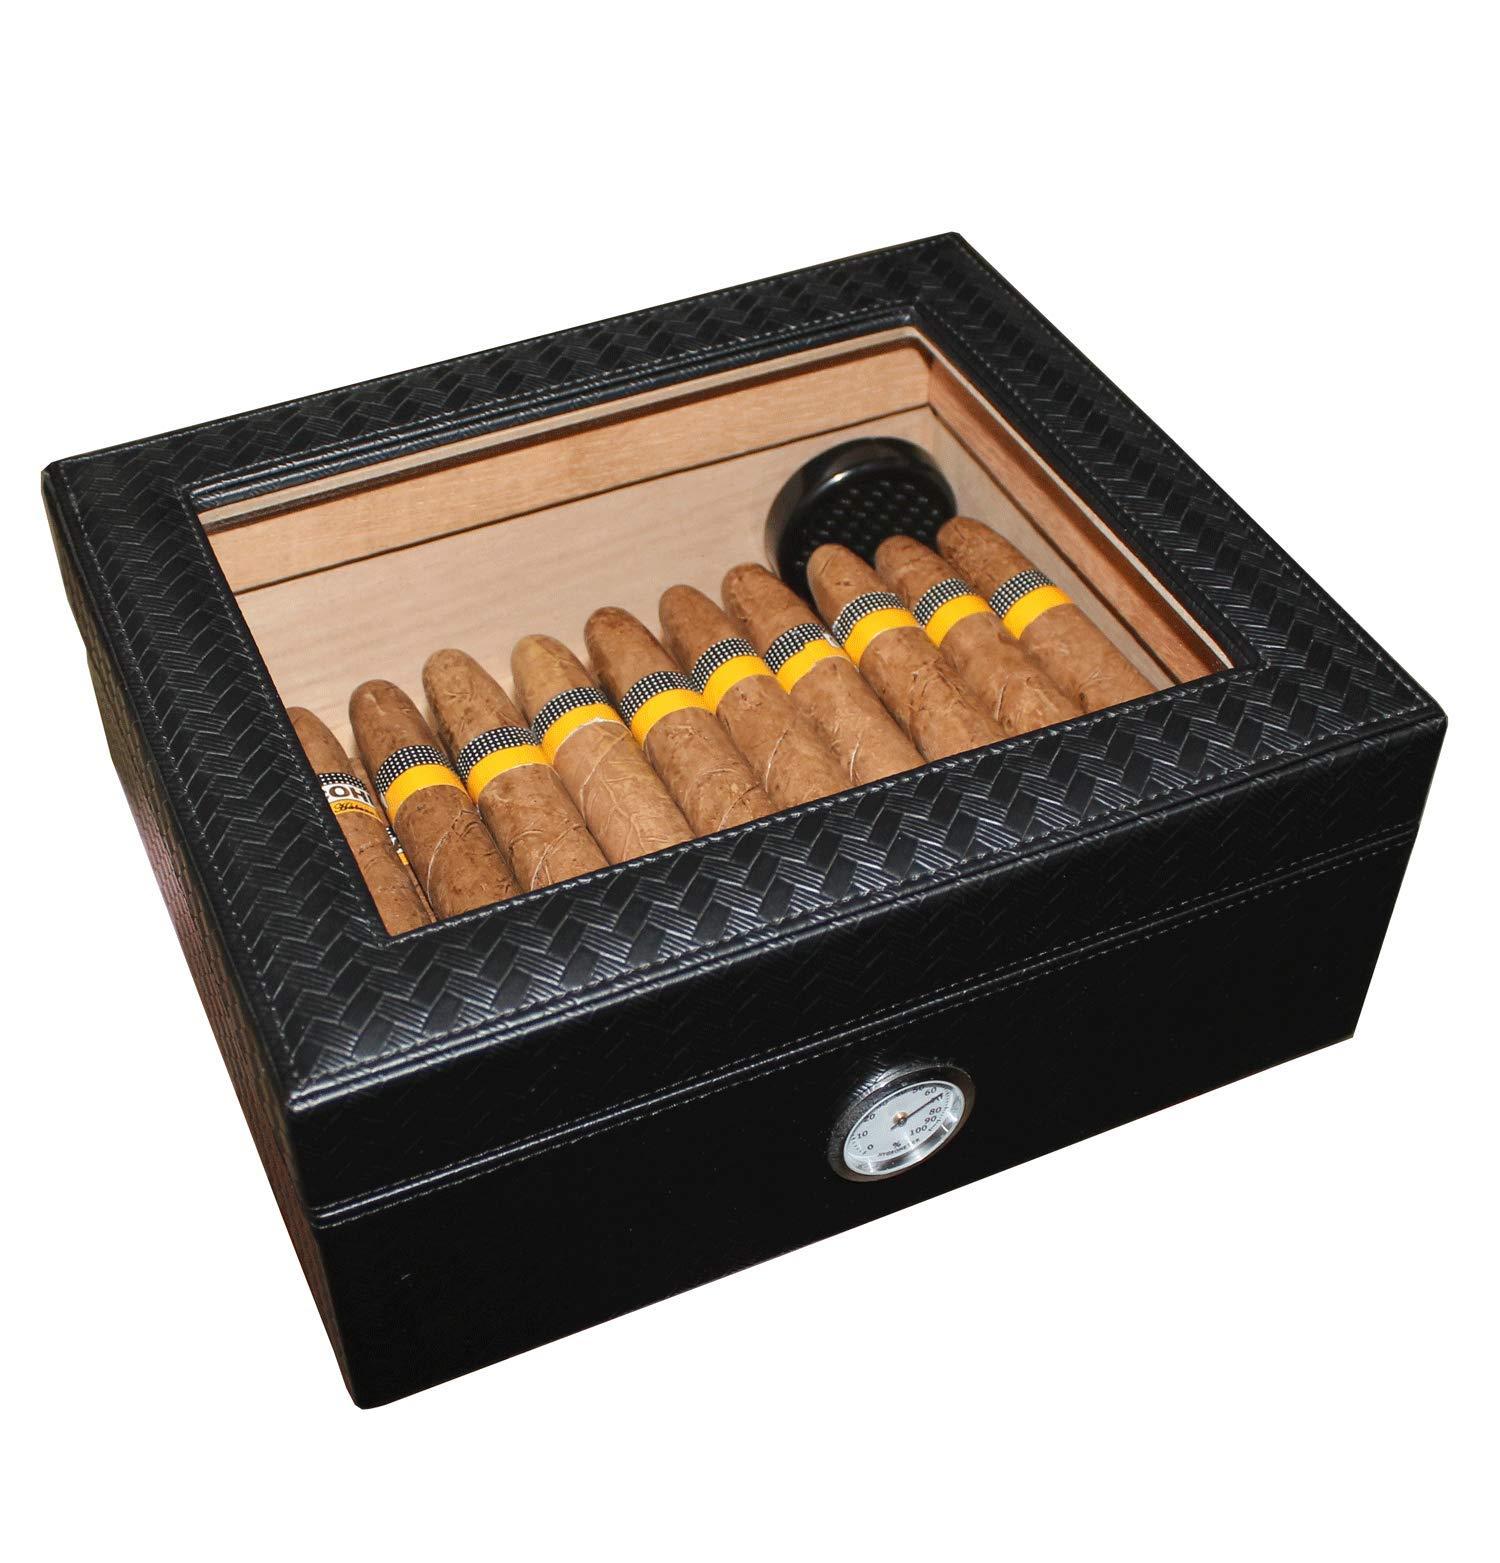 AMANCY Handmade Elegant Black Leather 25-50 Cigar Humidor,Desktop Cedar Wood Lined Cigar Box with Glasstop